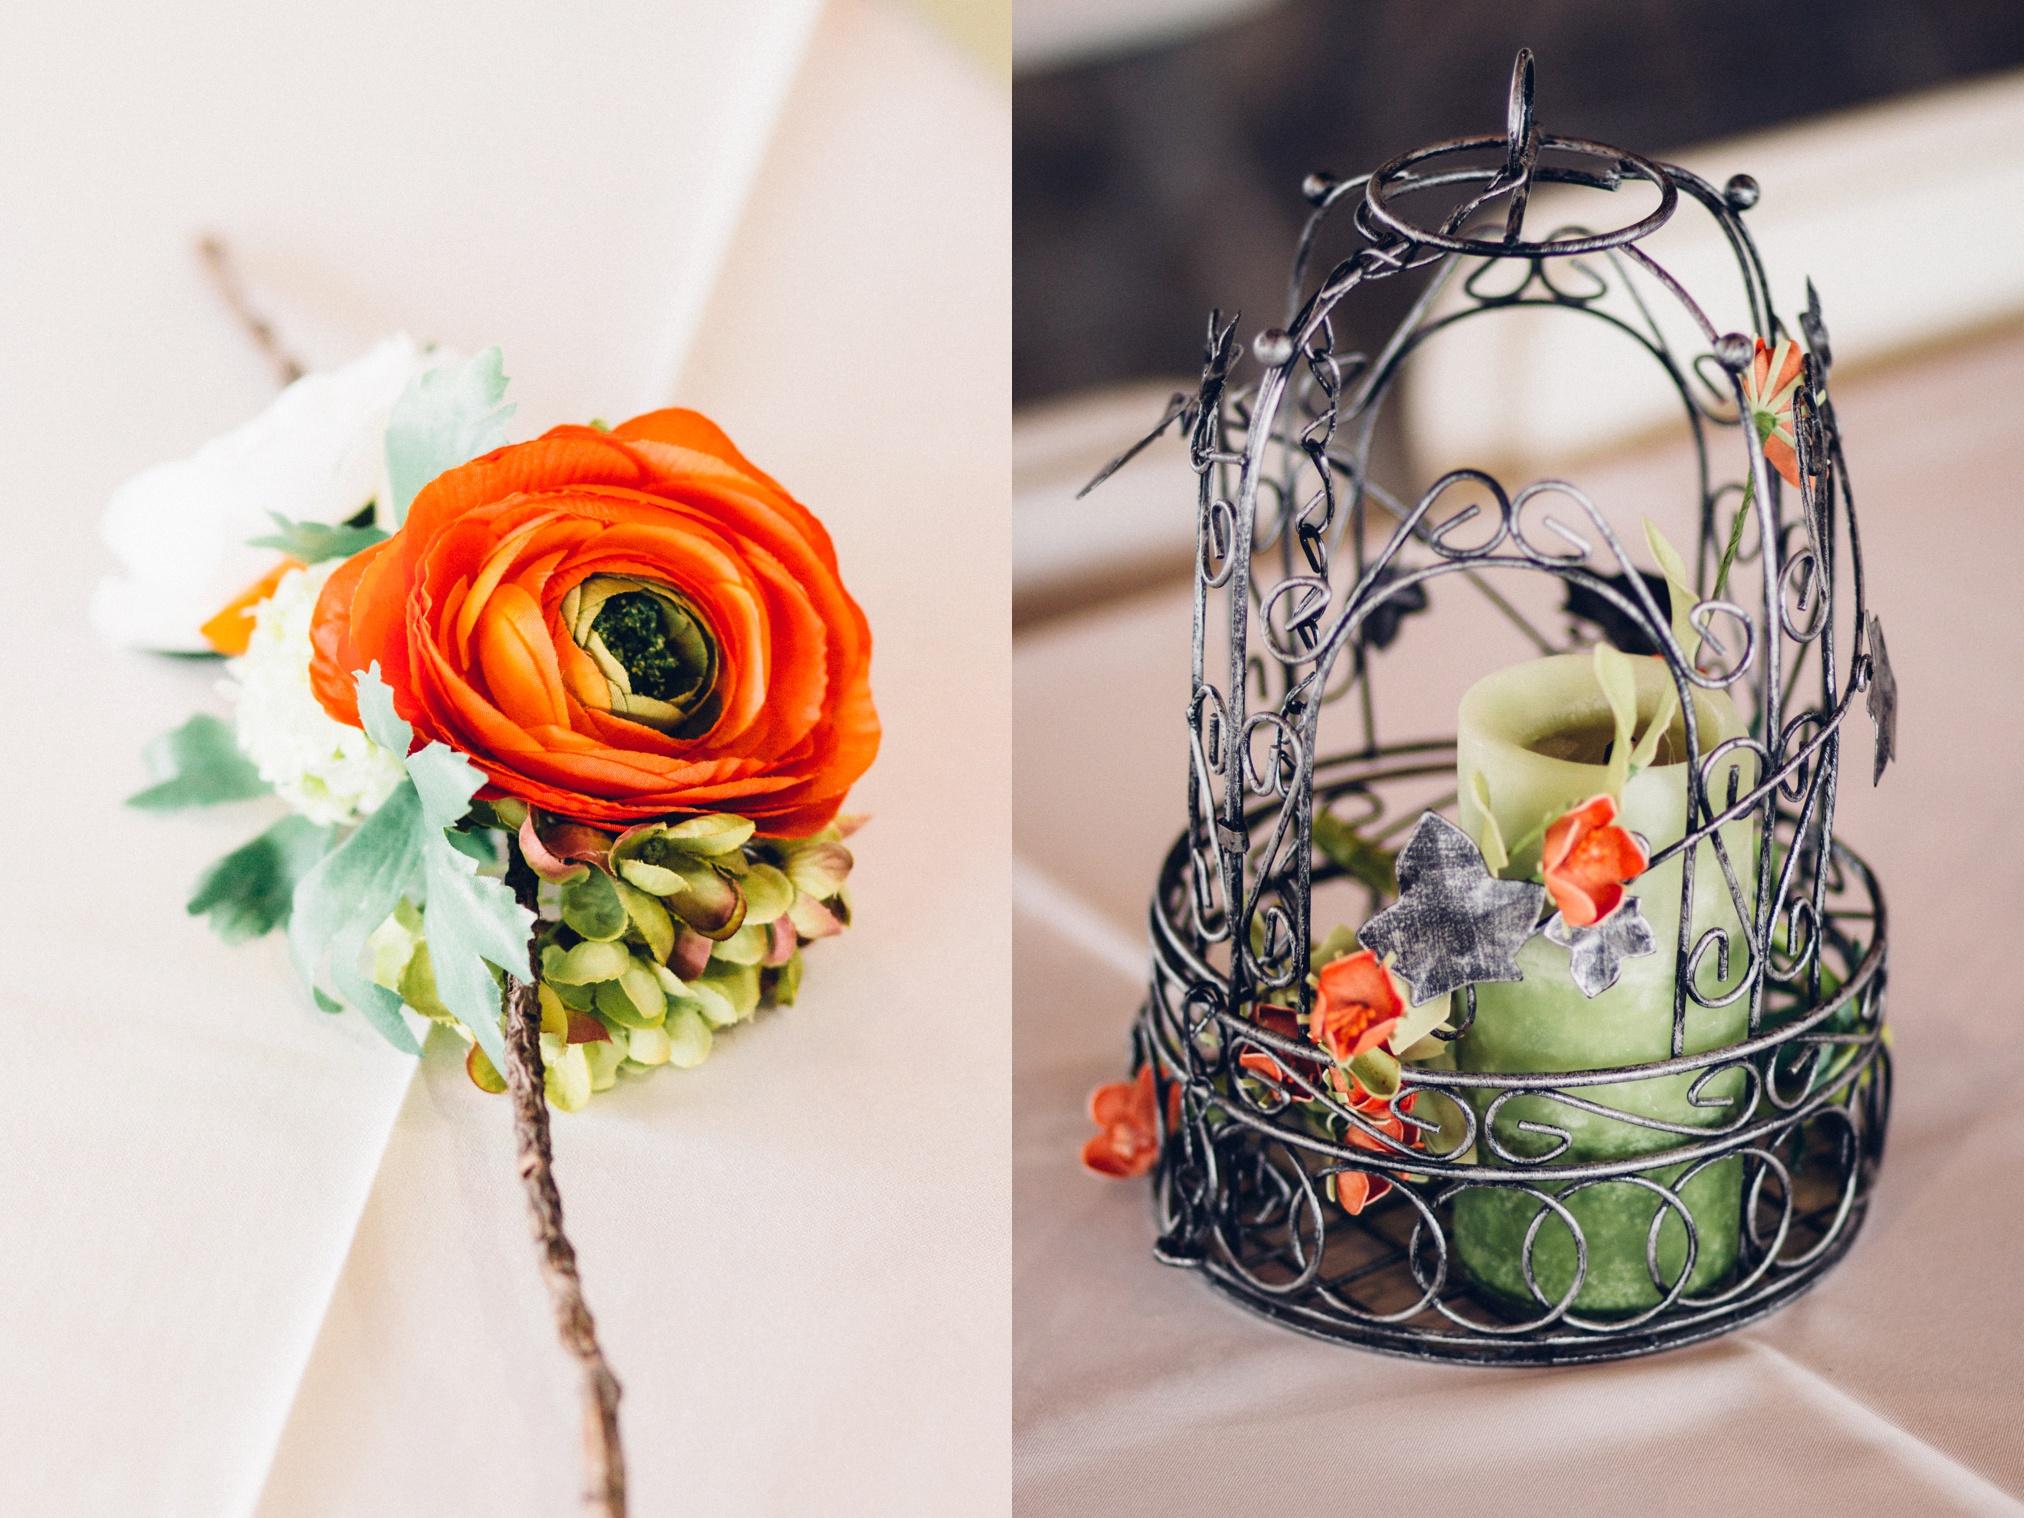 schmid_wedding-246.jpg